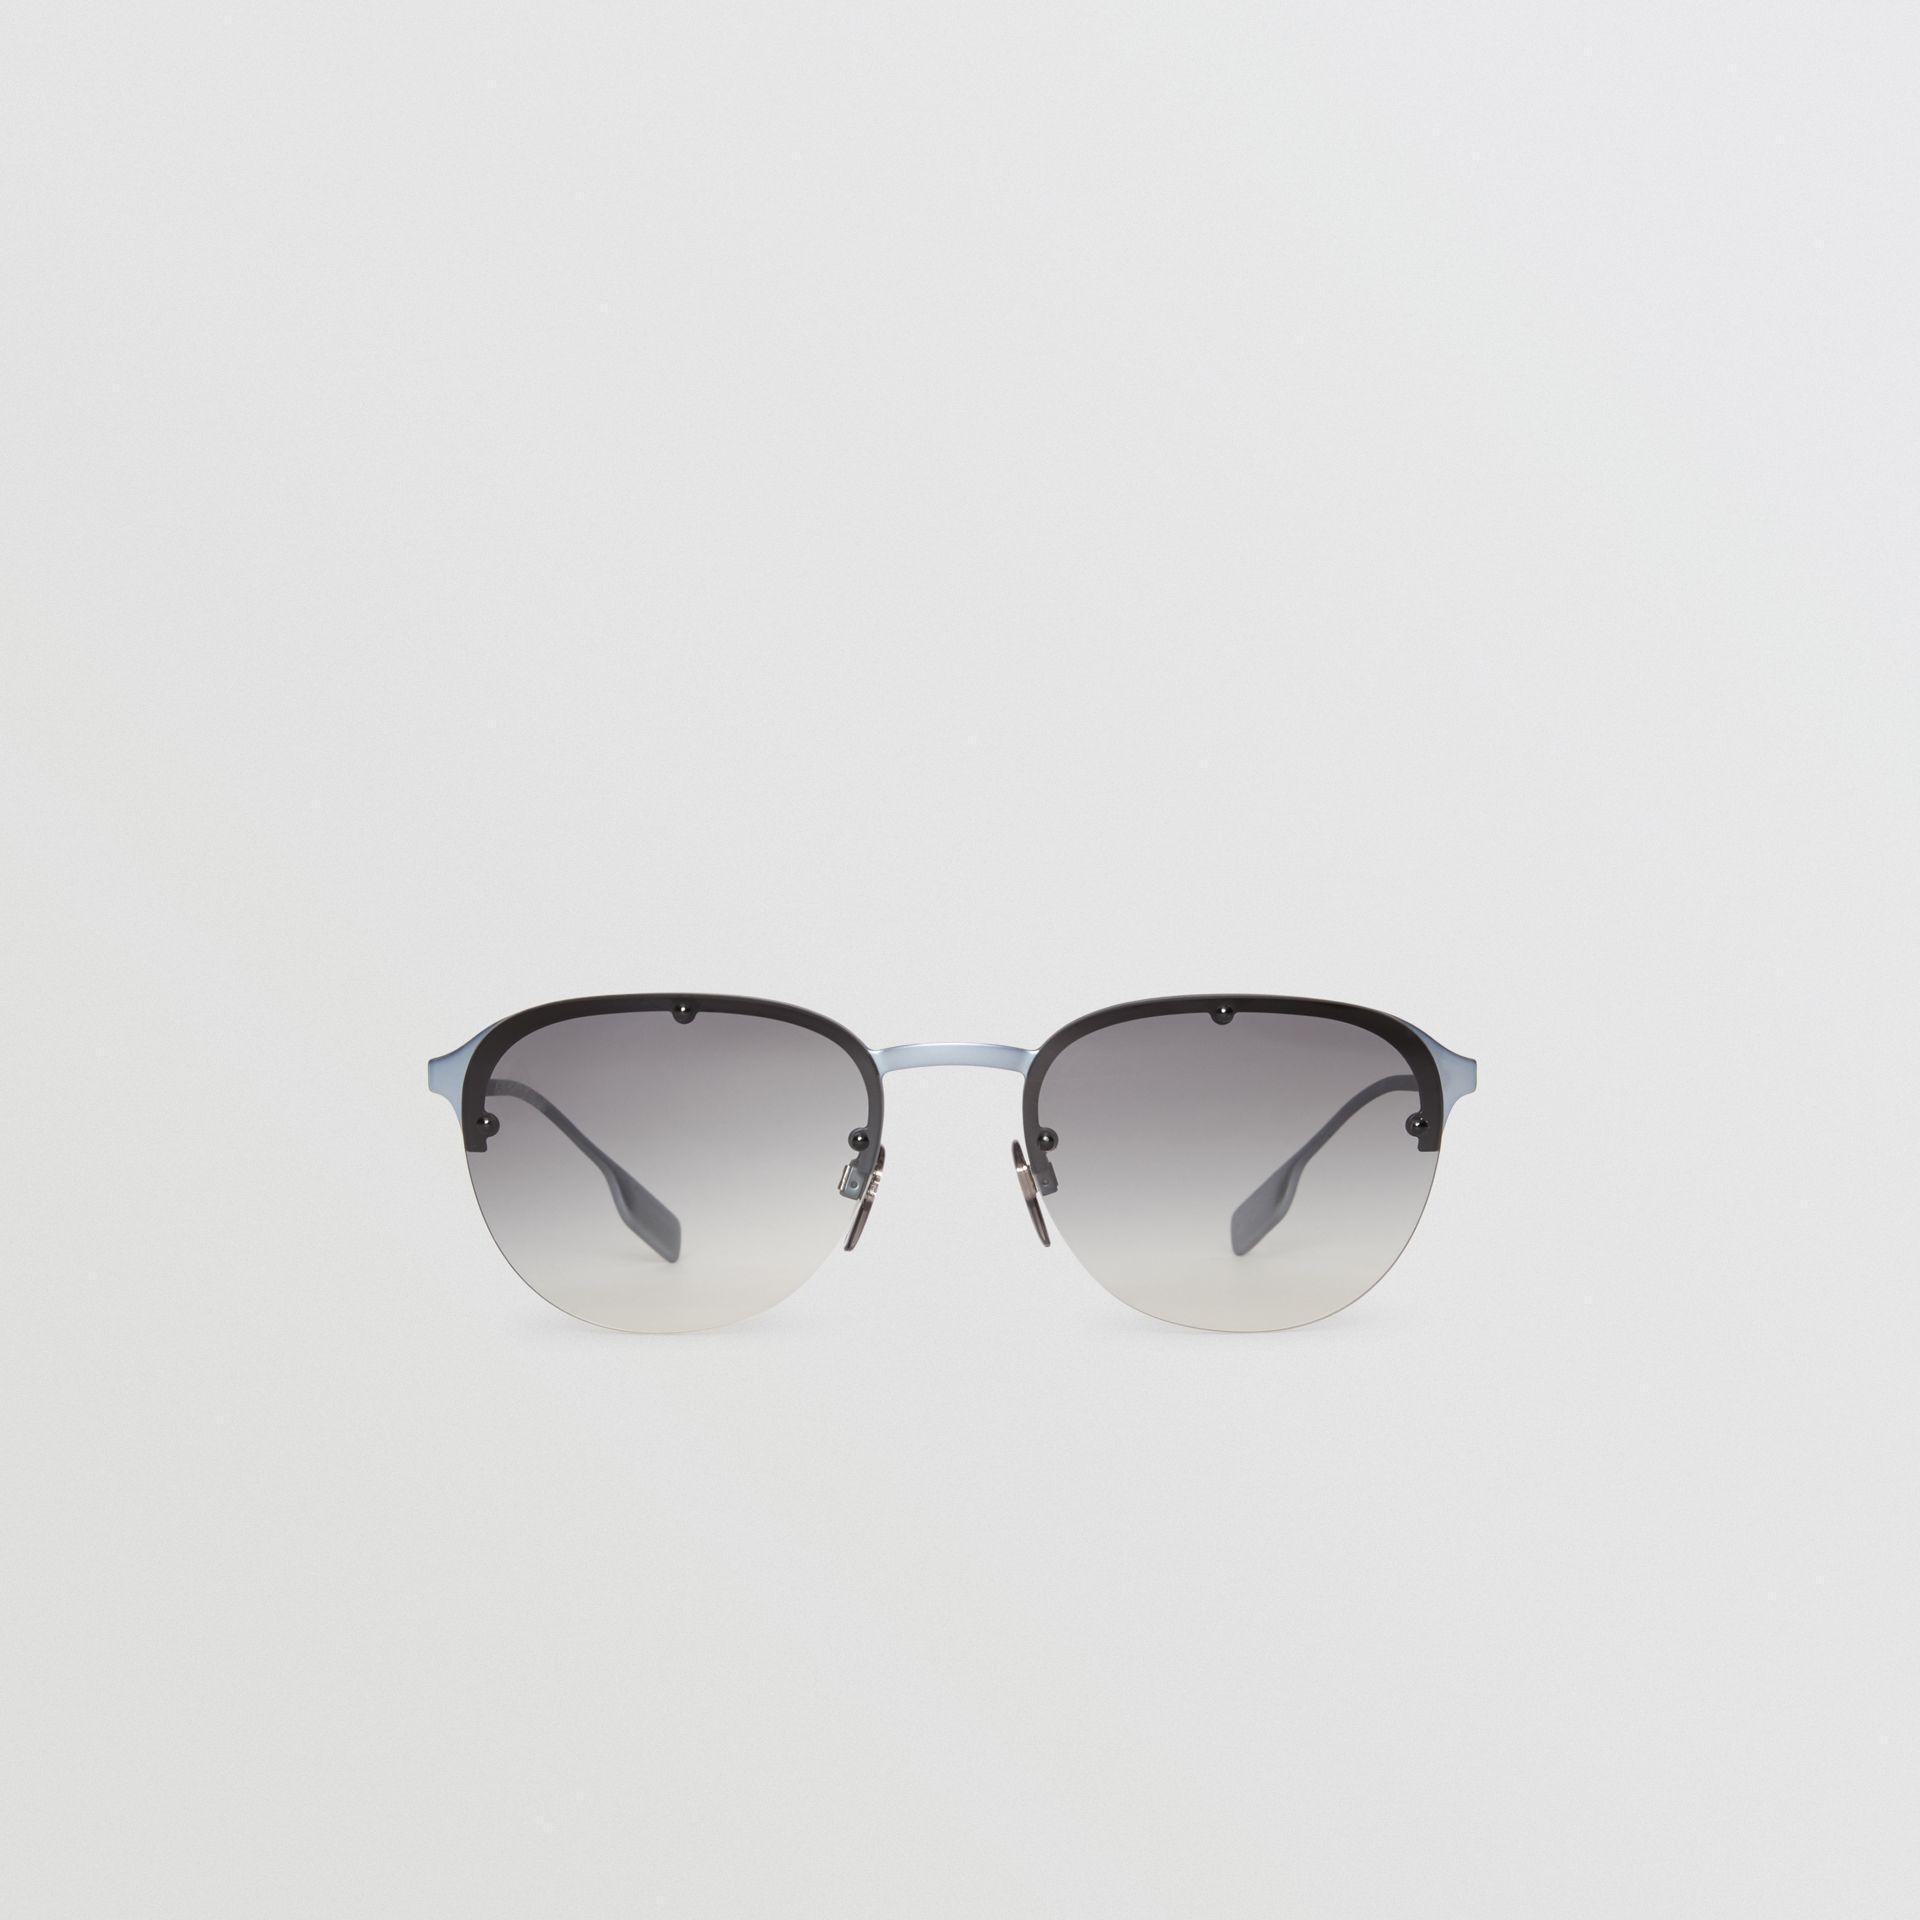 0b901031b68 Burberry Round Frame Sunglasses in Gray for Men - Lyst